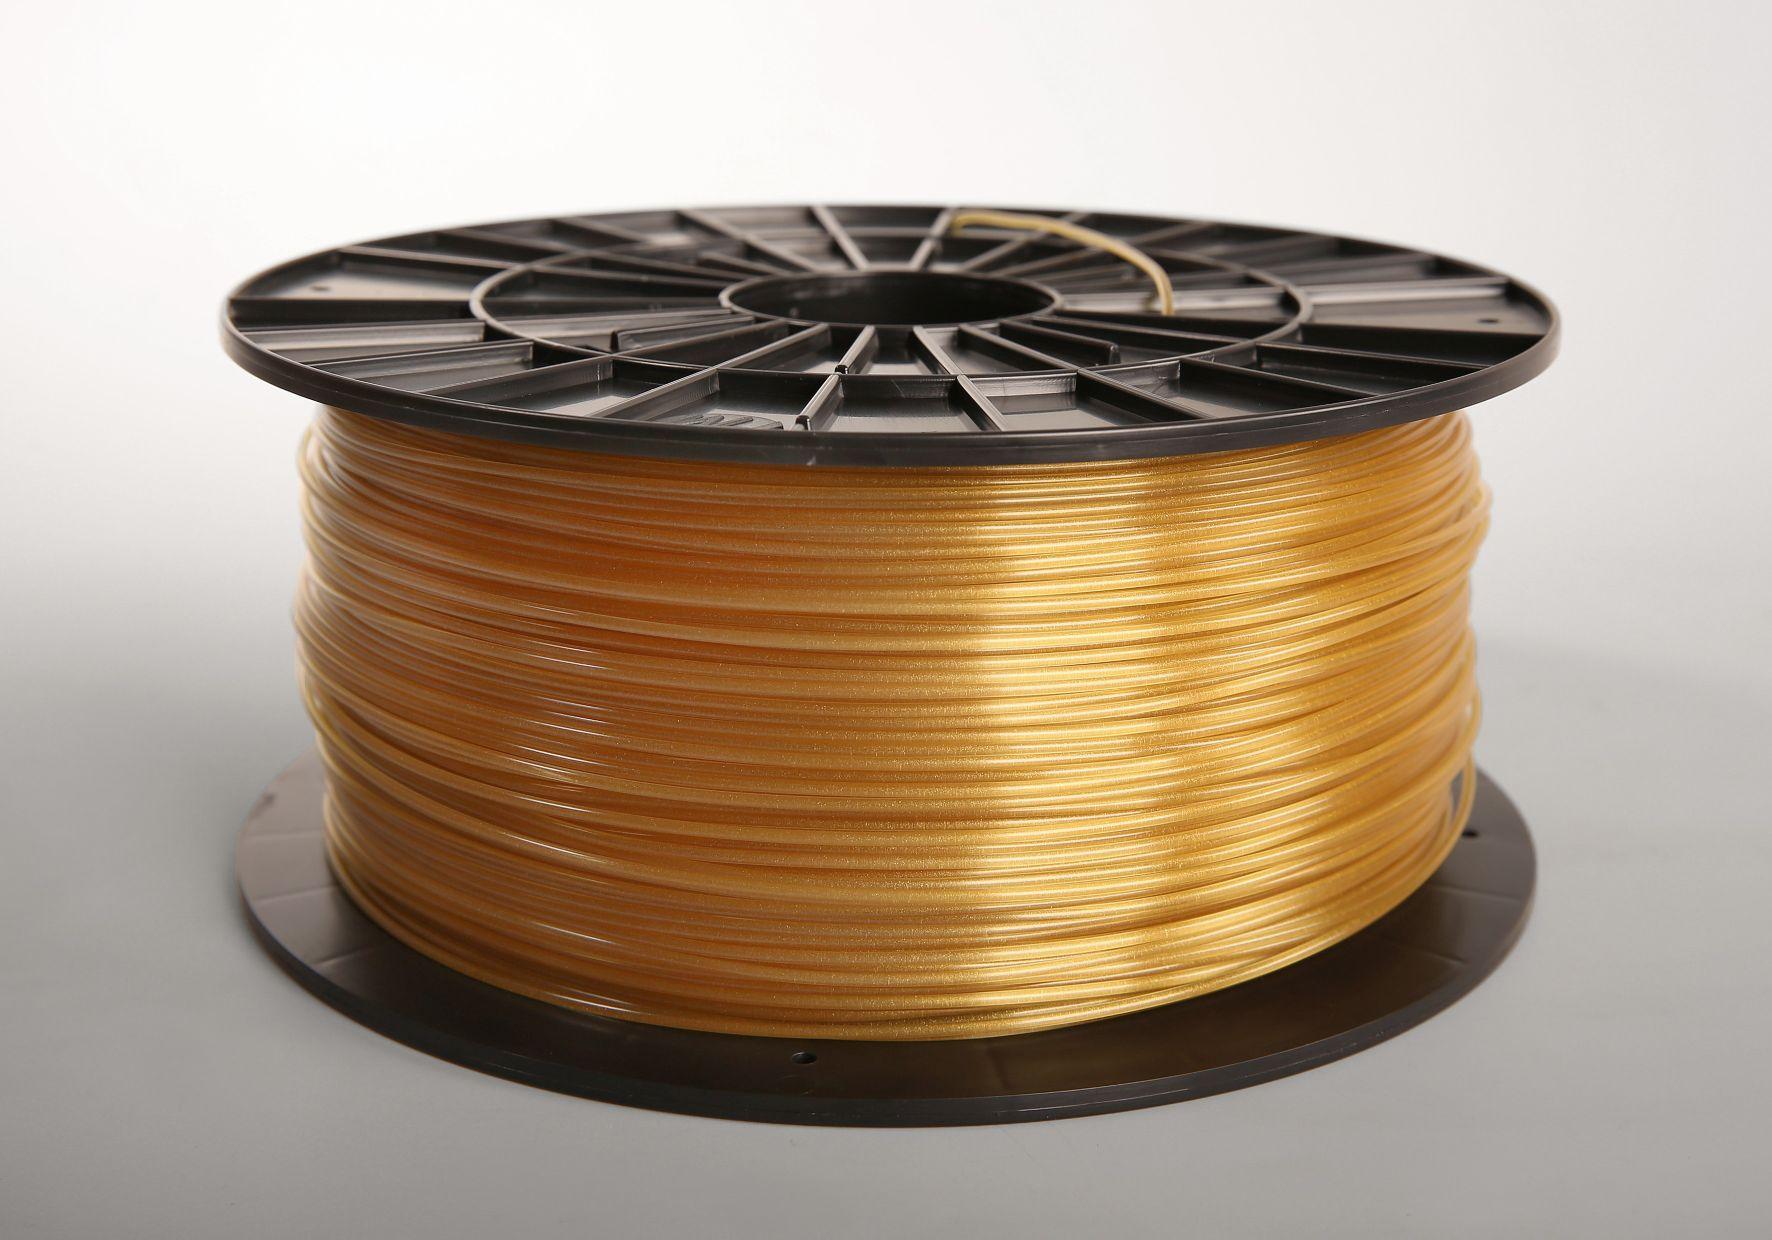 filament abs-t auriu 1.75mm 1kg rola